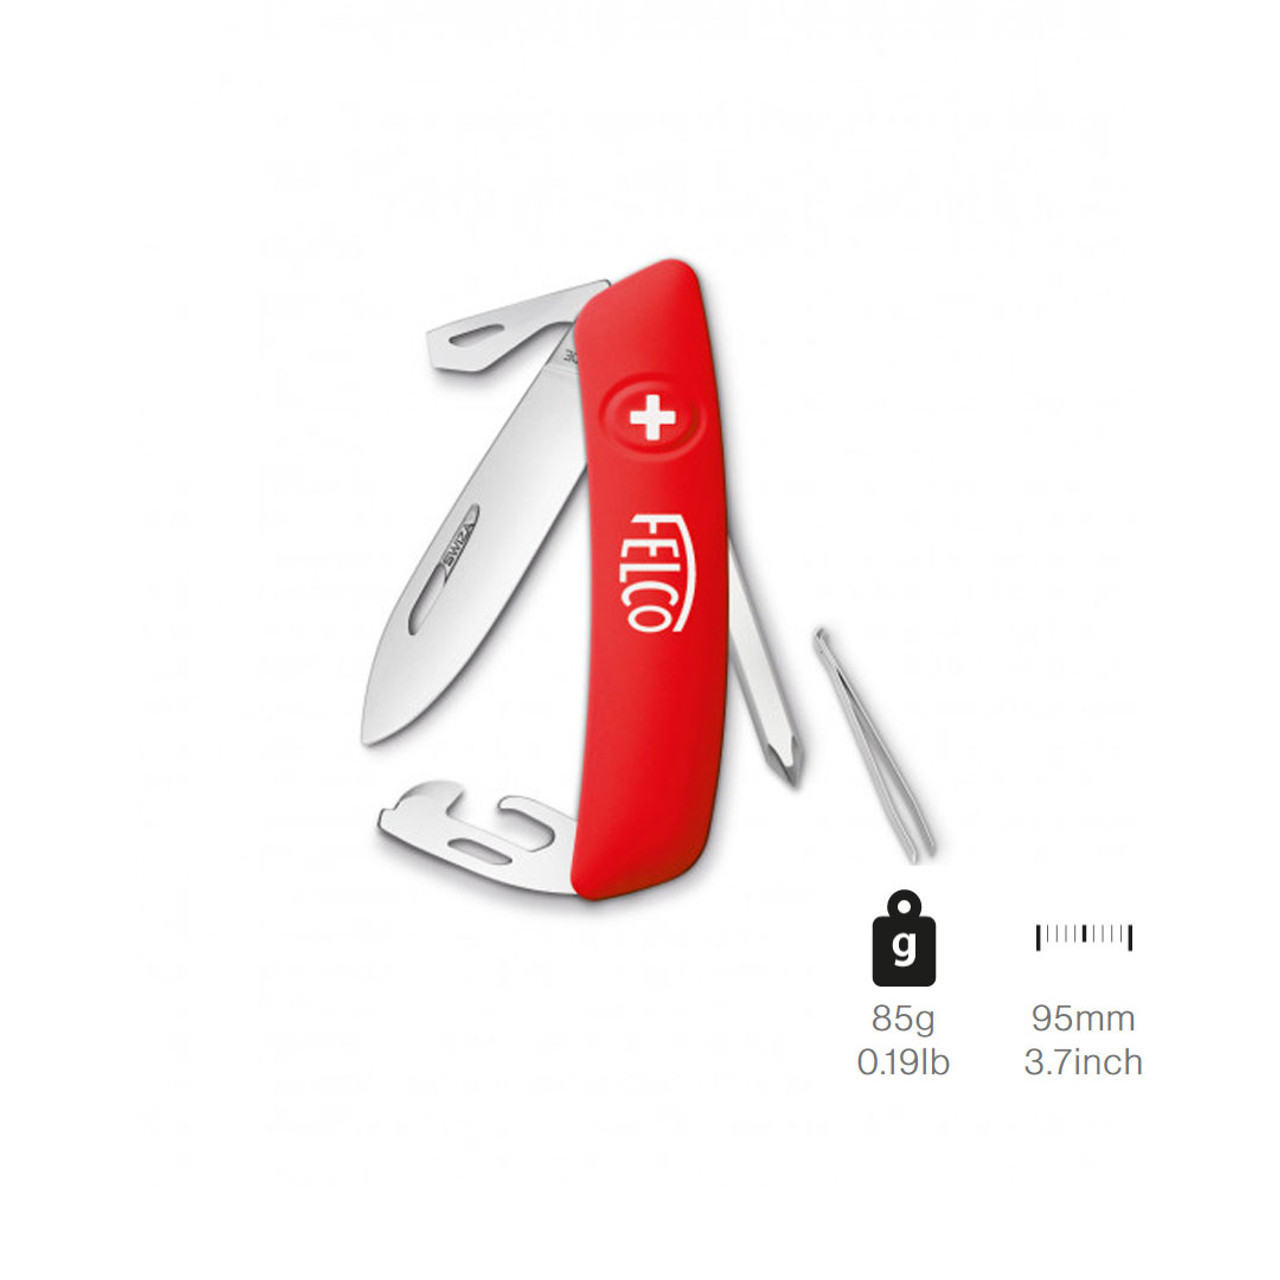 Knife Felco 504 Swiss 9 Functions + Screwdriver